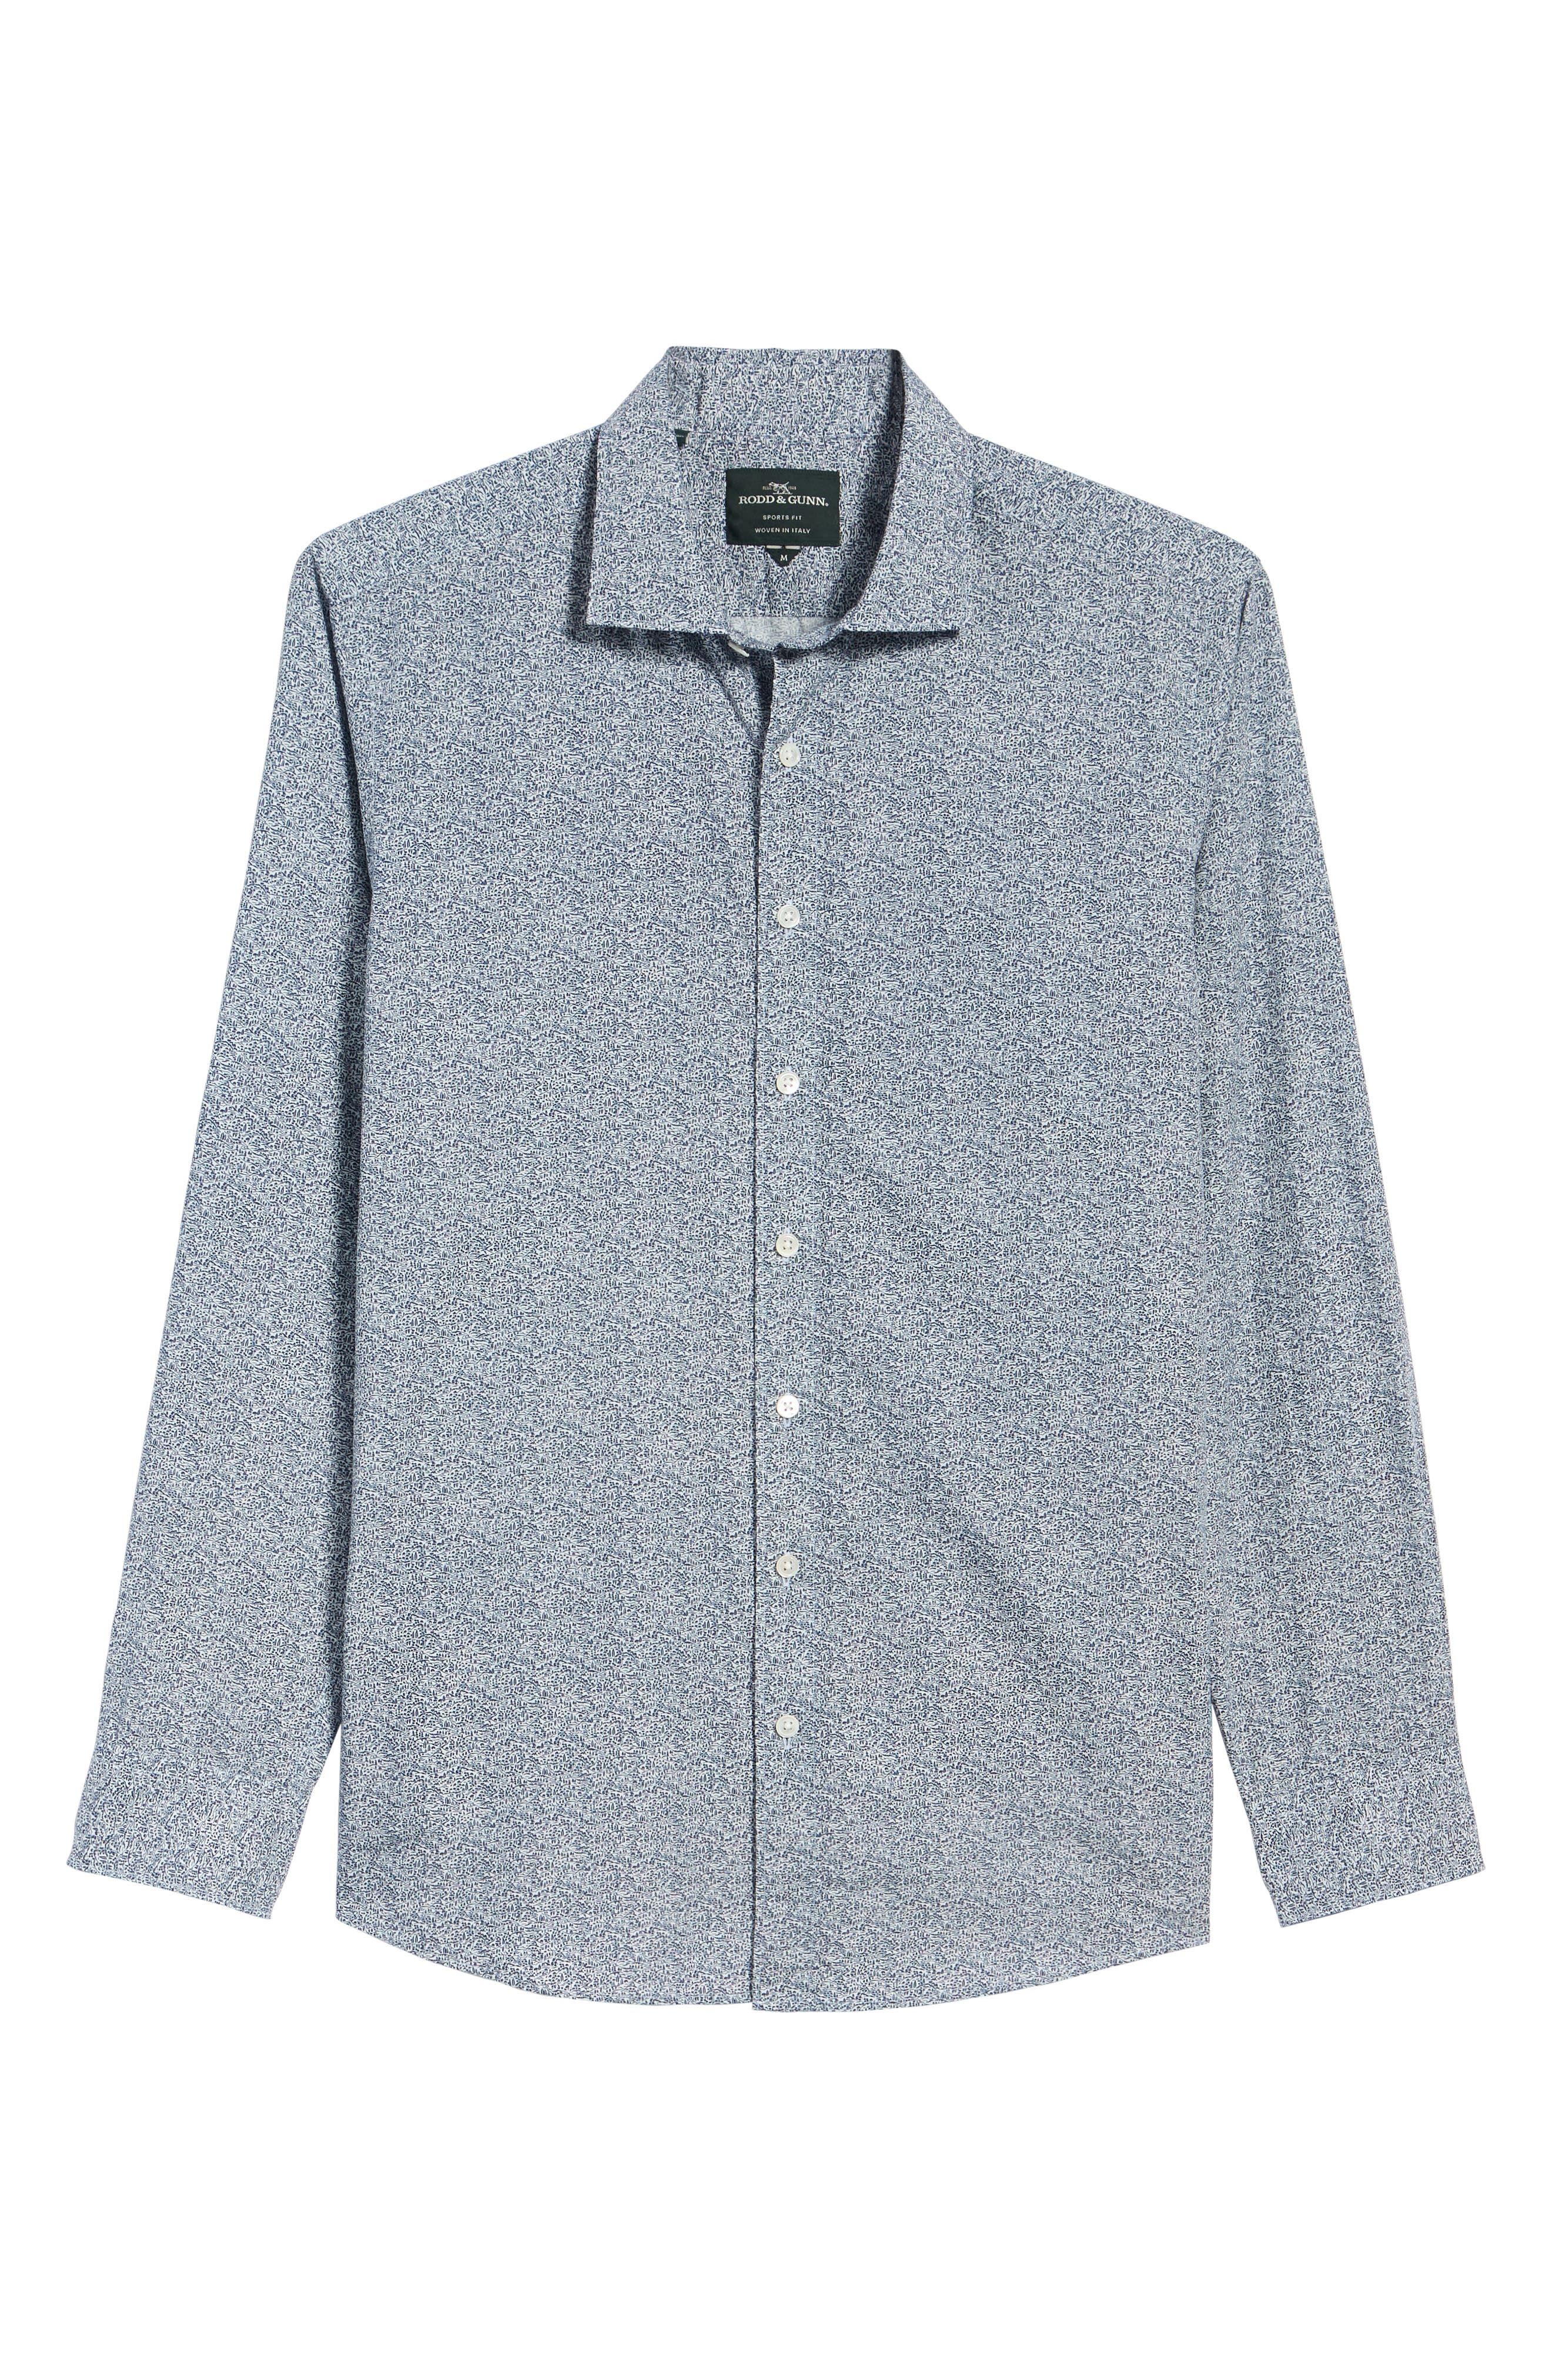 Massey West Slim Fit Sport Shirt,                             Alternate thumbnail 6, color,                             Ink